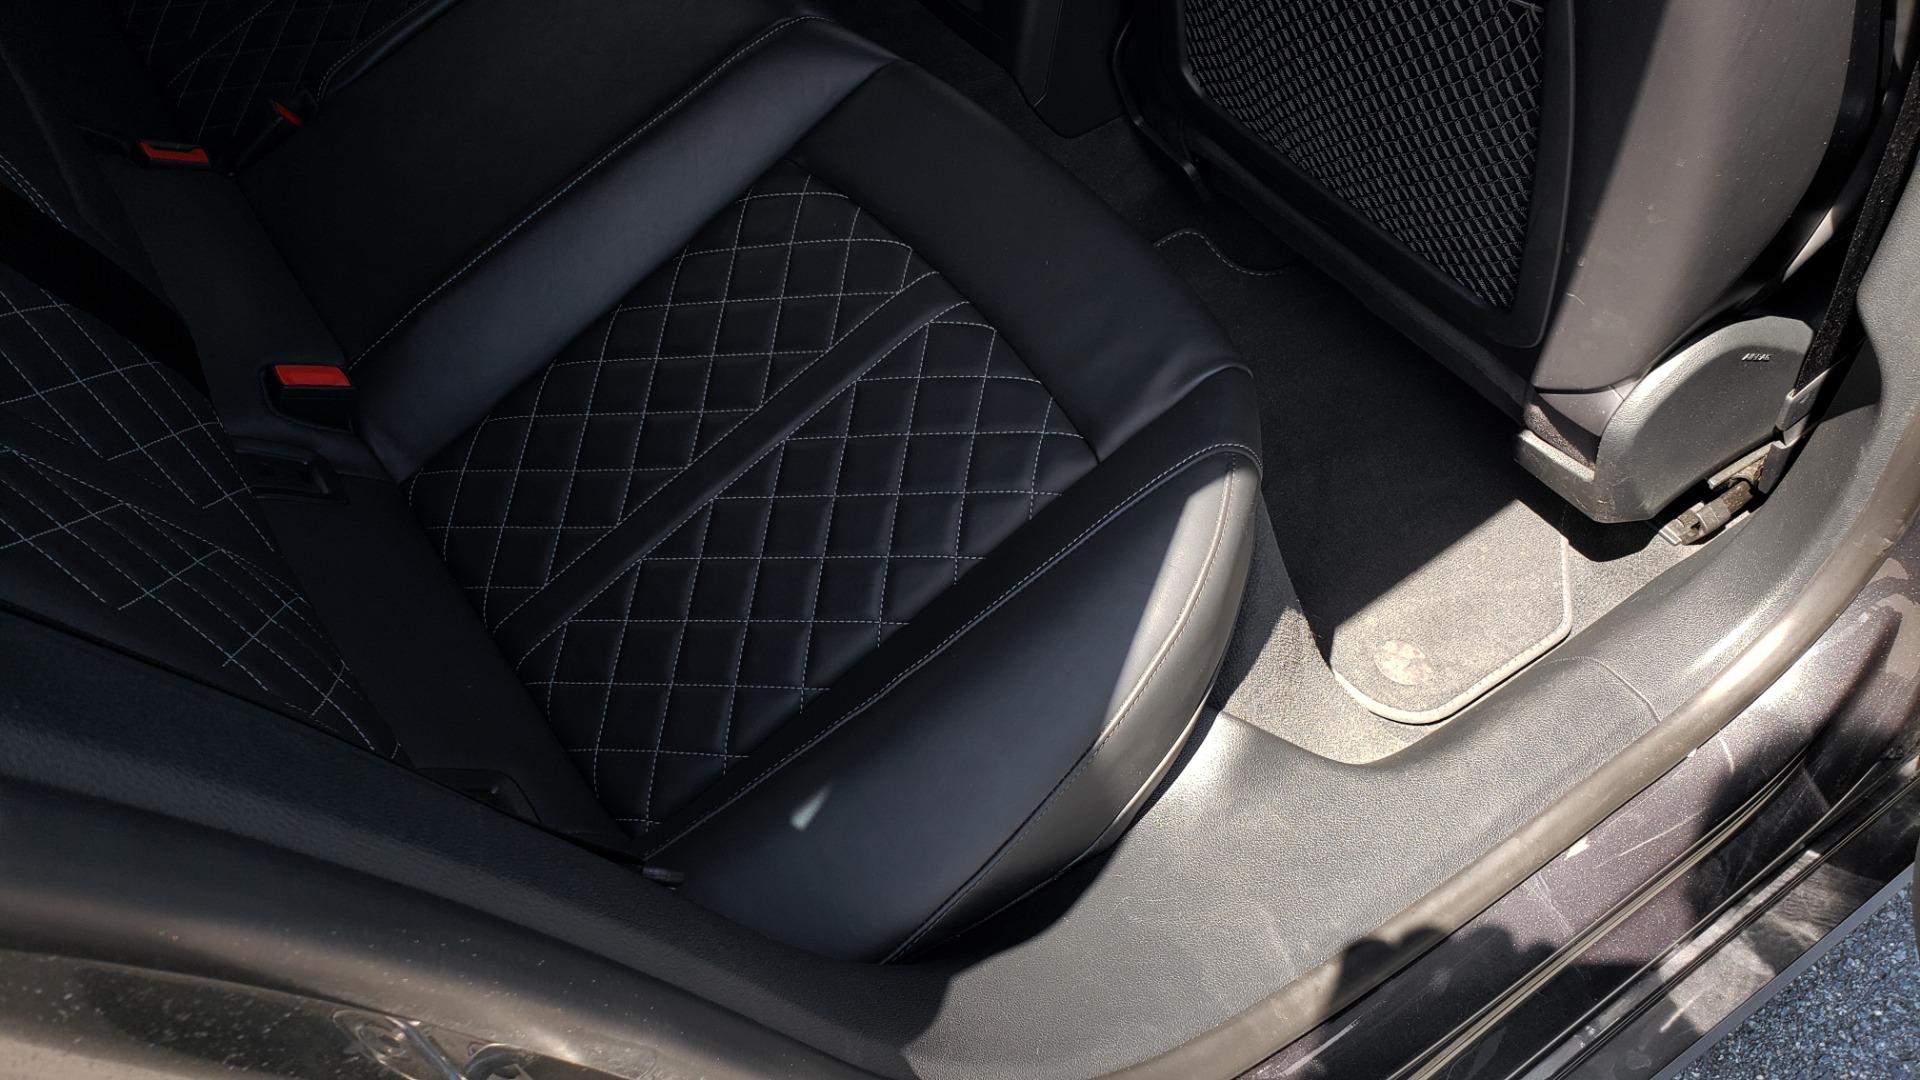 Used 2018 Audi S5 SPORTBACK PRESTIGE S-SPORT / NAV / SUNROOF / HUD / B&O SND / REARVIEW for sale $48,995 at Formula Imports in Charlotte NC 28227 61